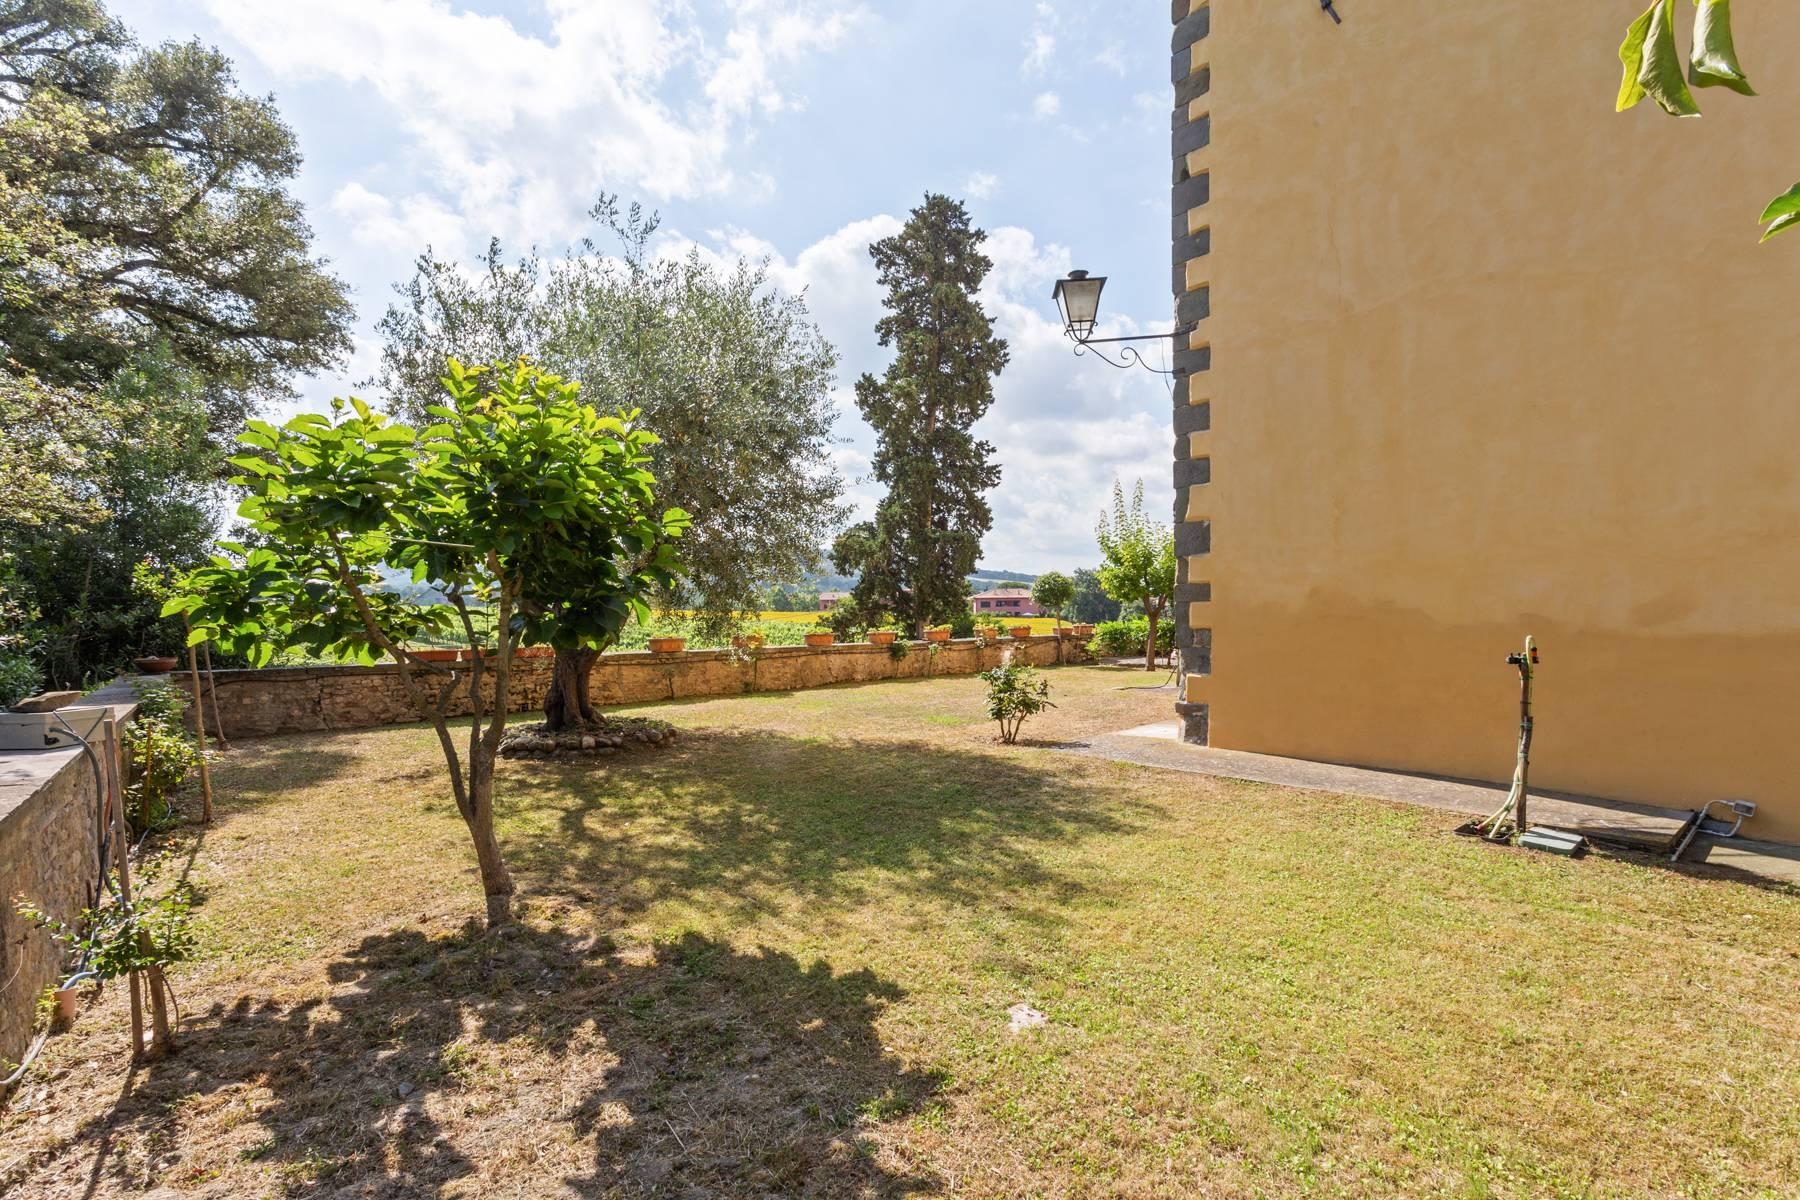 Appartamento in Vendita a Scandicci: 5 locali, 170 mq - Foto 15